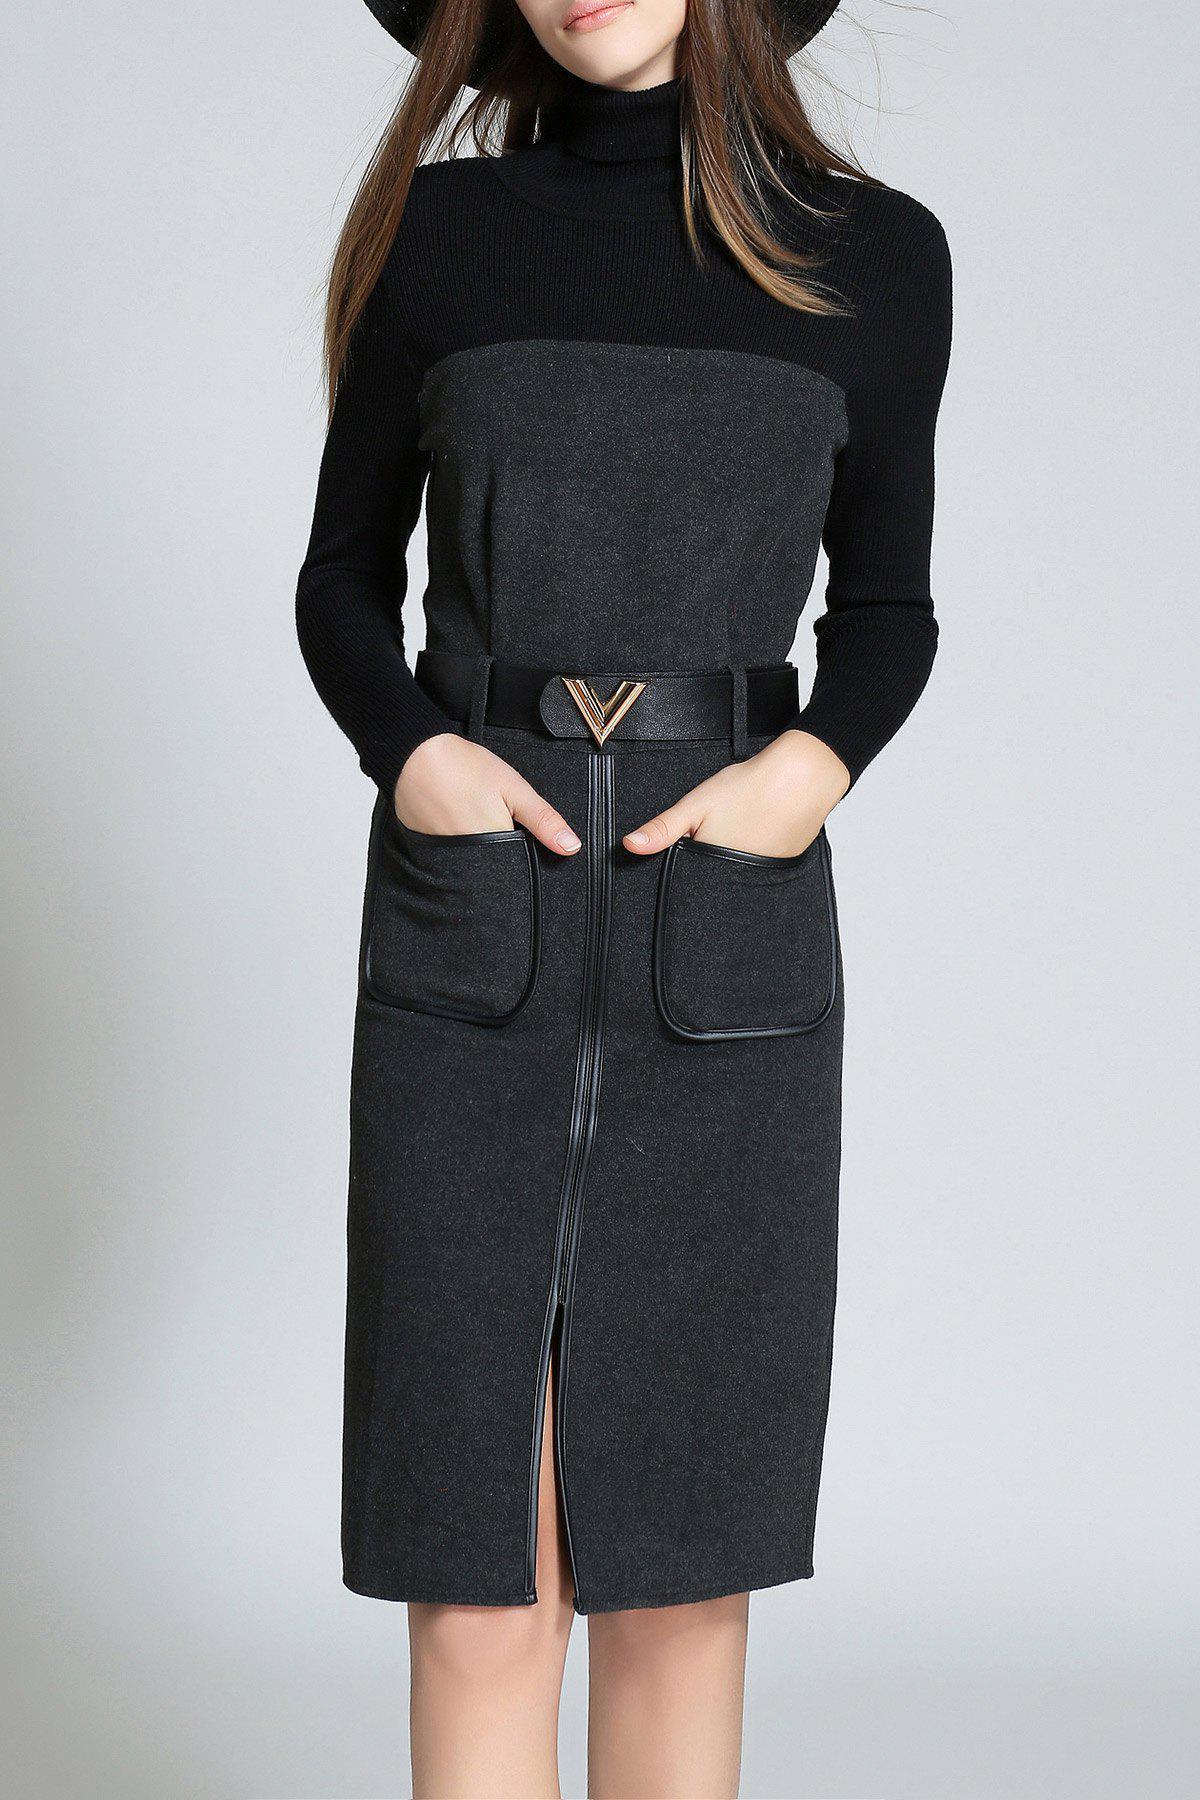 High Neck Long Sleeve Front Slit Sweater Dress